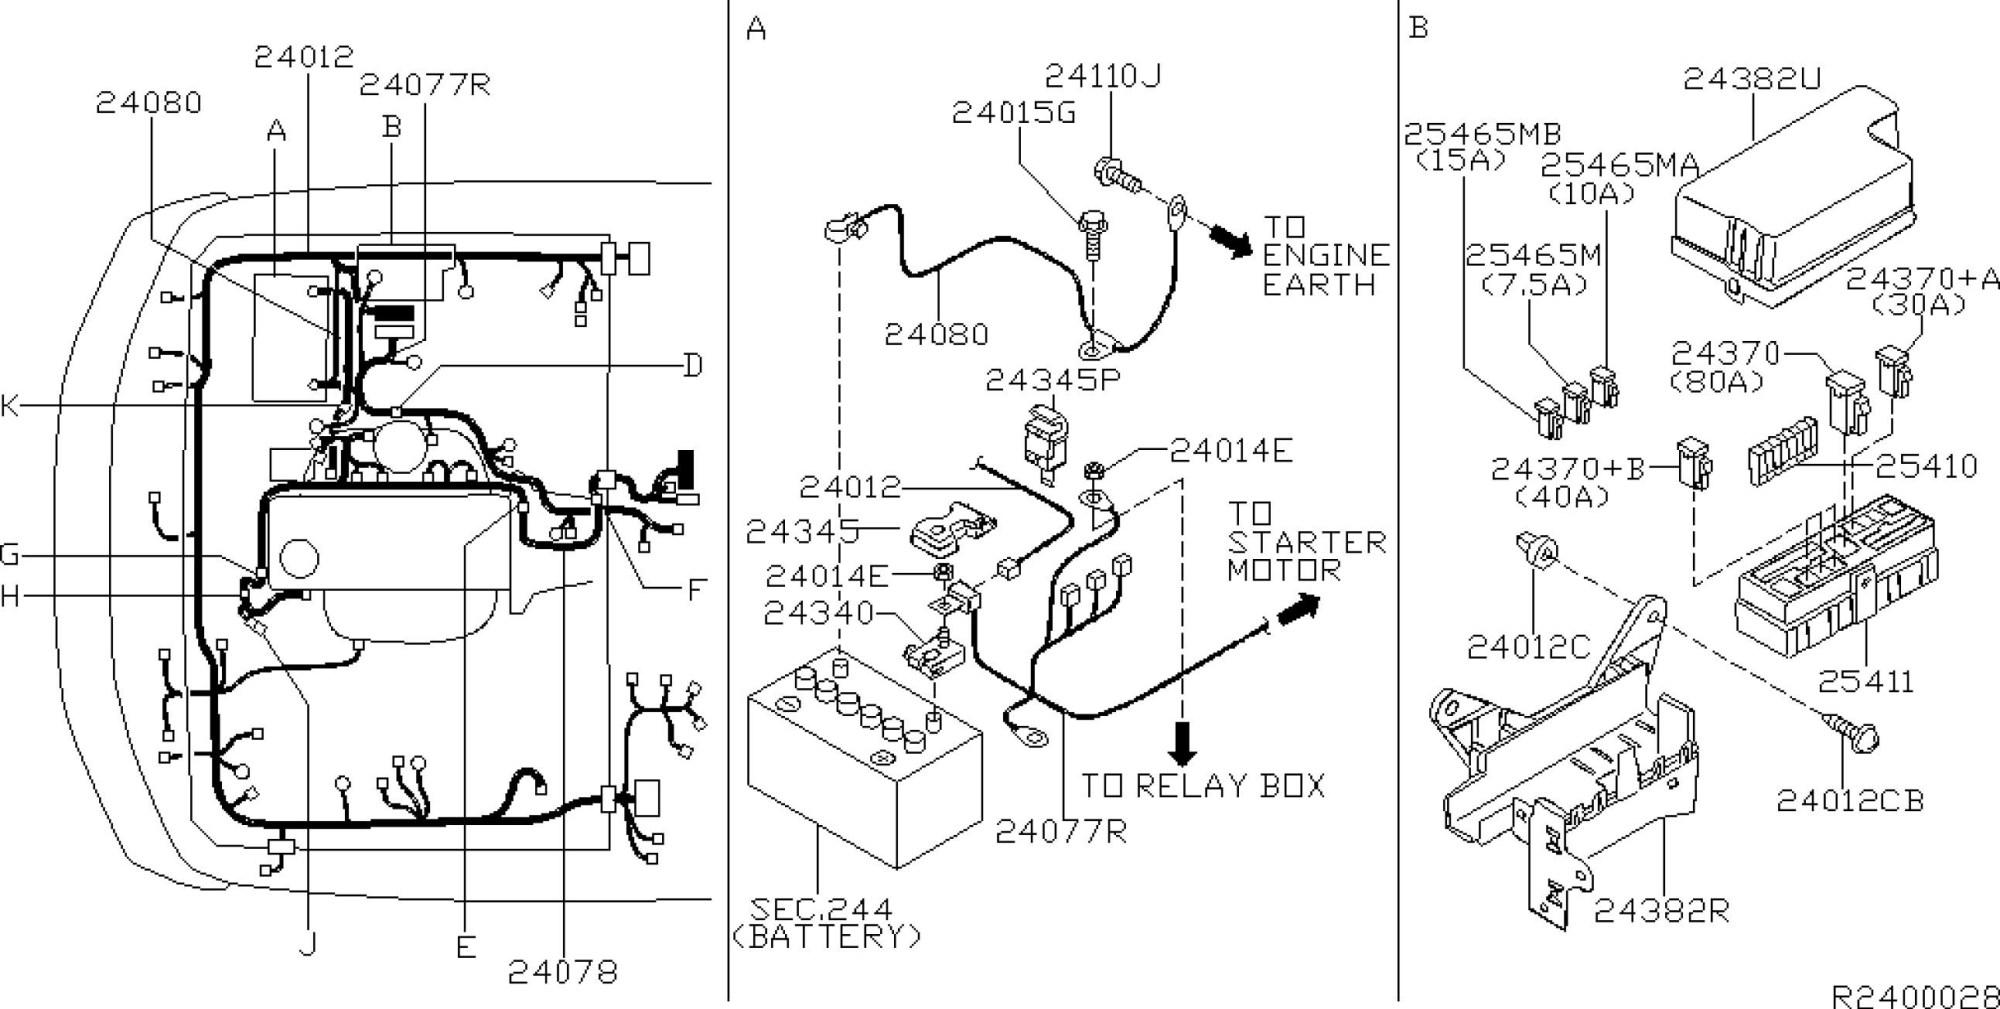 hight resolution of 2006 nissan pathfinder engine diagram 2002 nissan xterra oem parts nissan usa estore of 2006 nissan